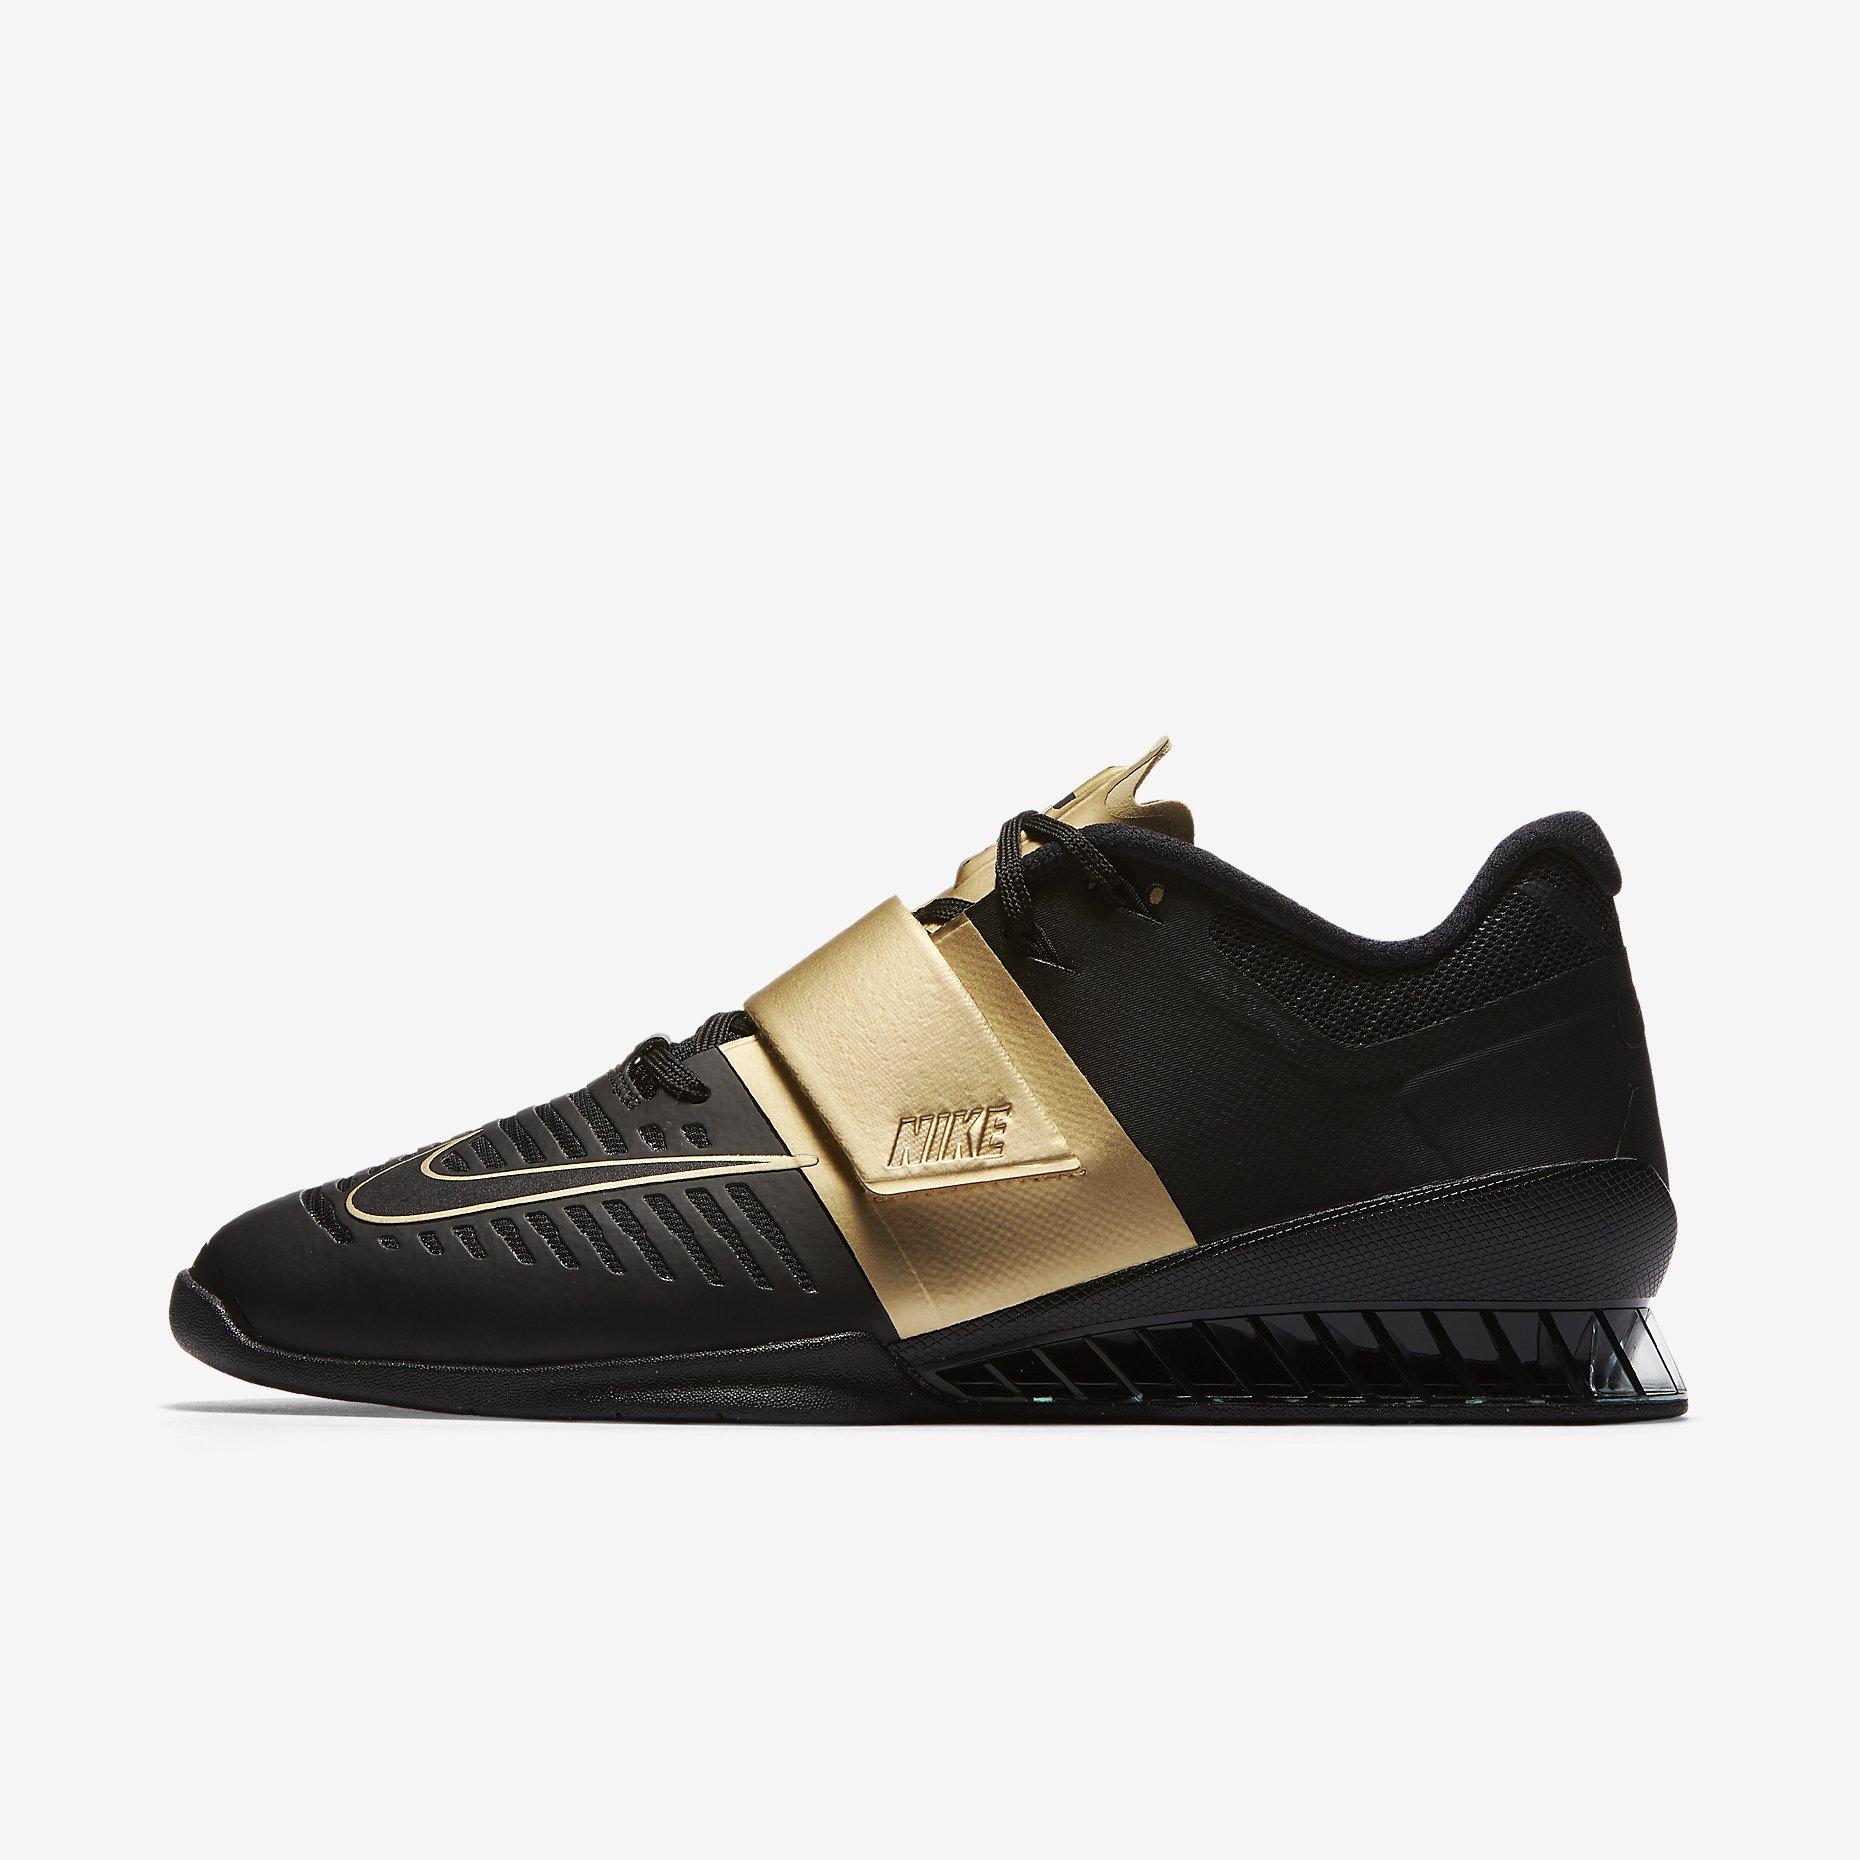 romaleos-3-x-mens-training-shoe